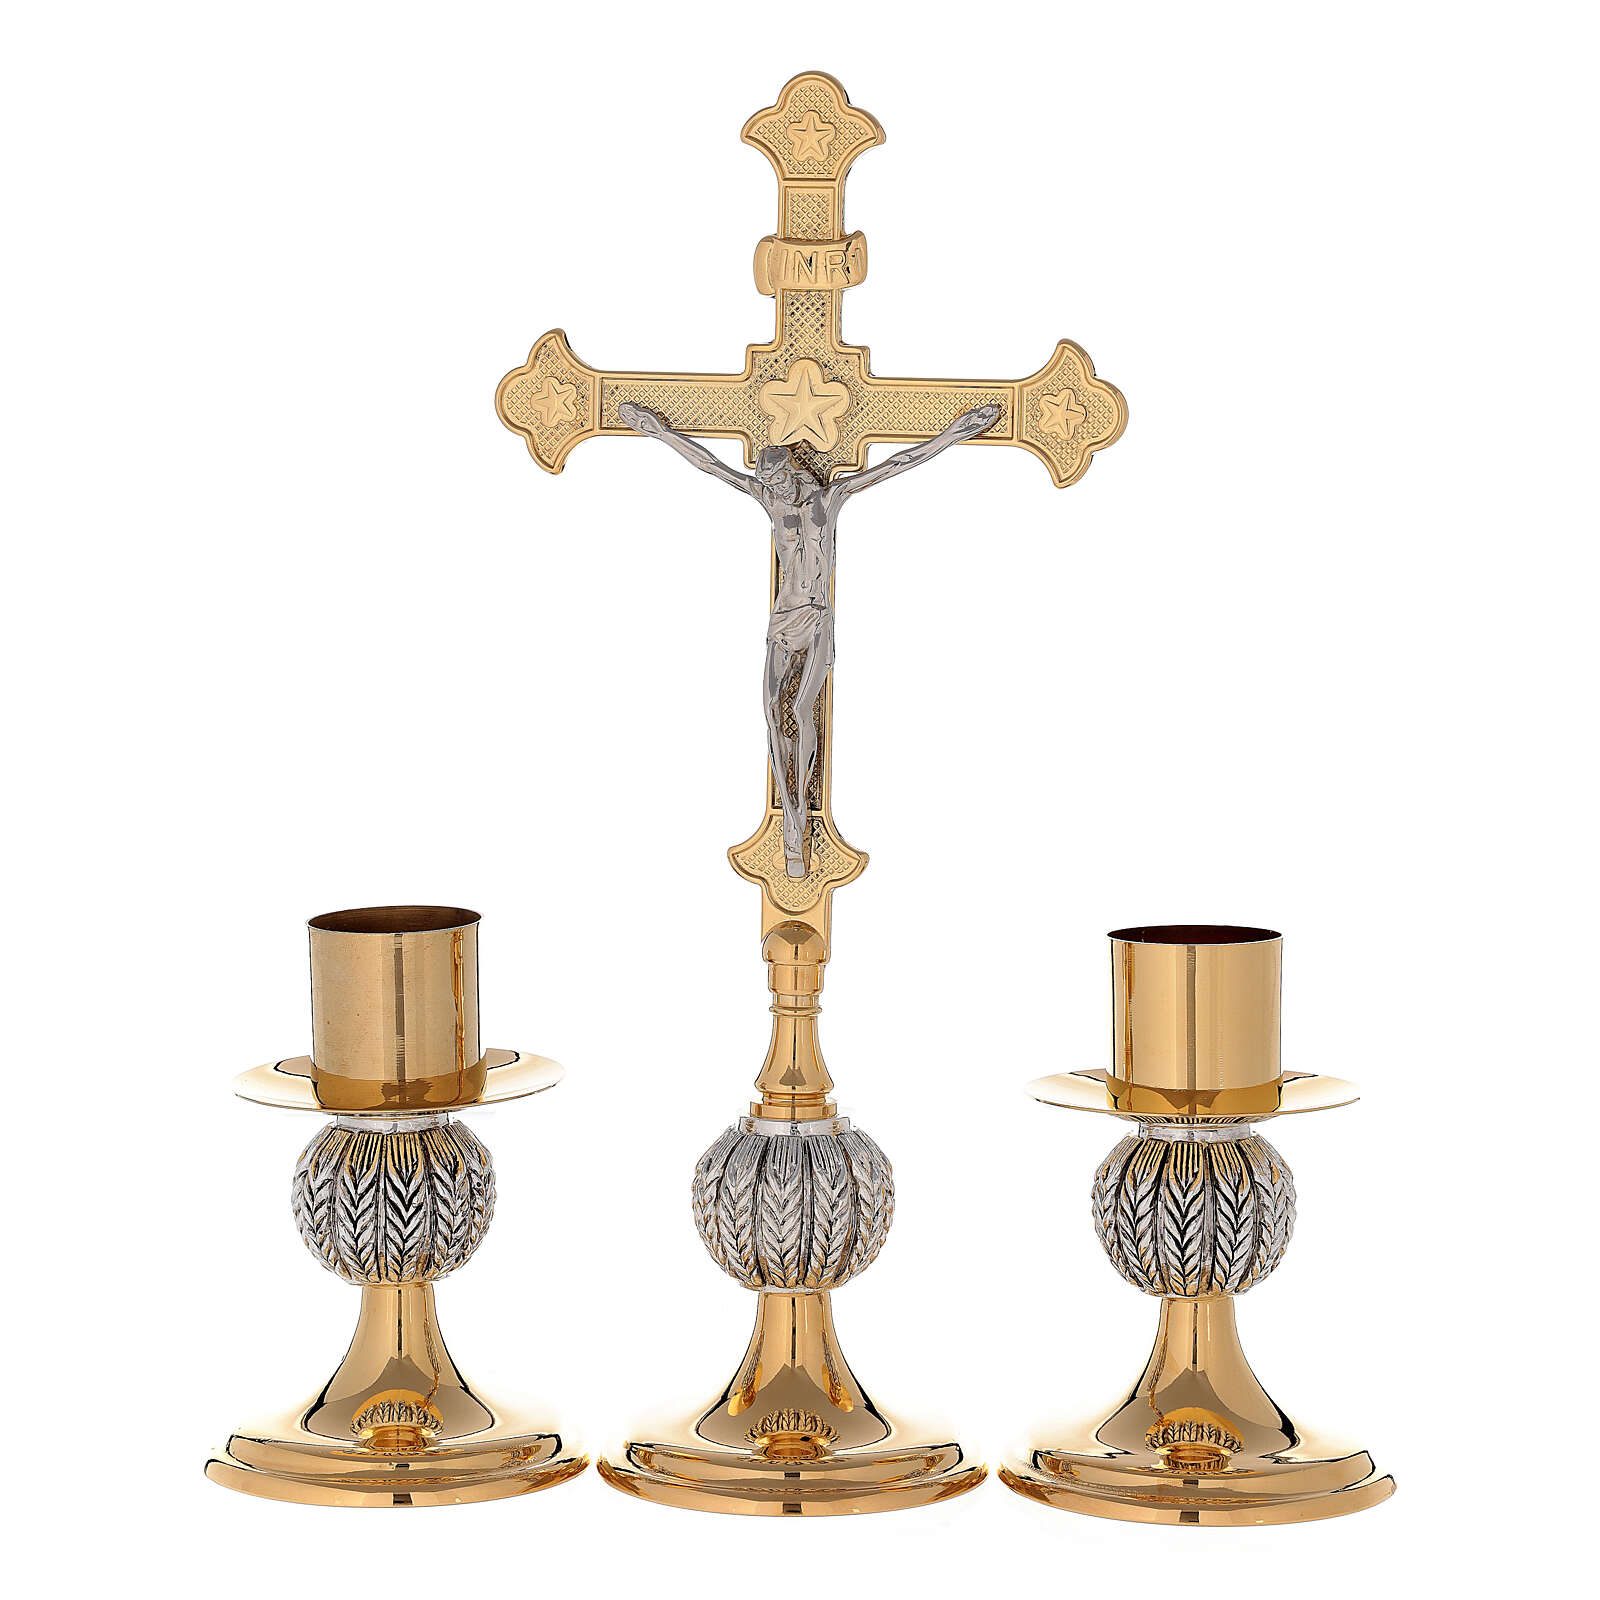 Cruz altar nudo espigas latón dorado 24k con candeleros 4